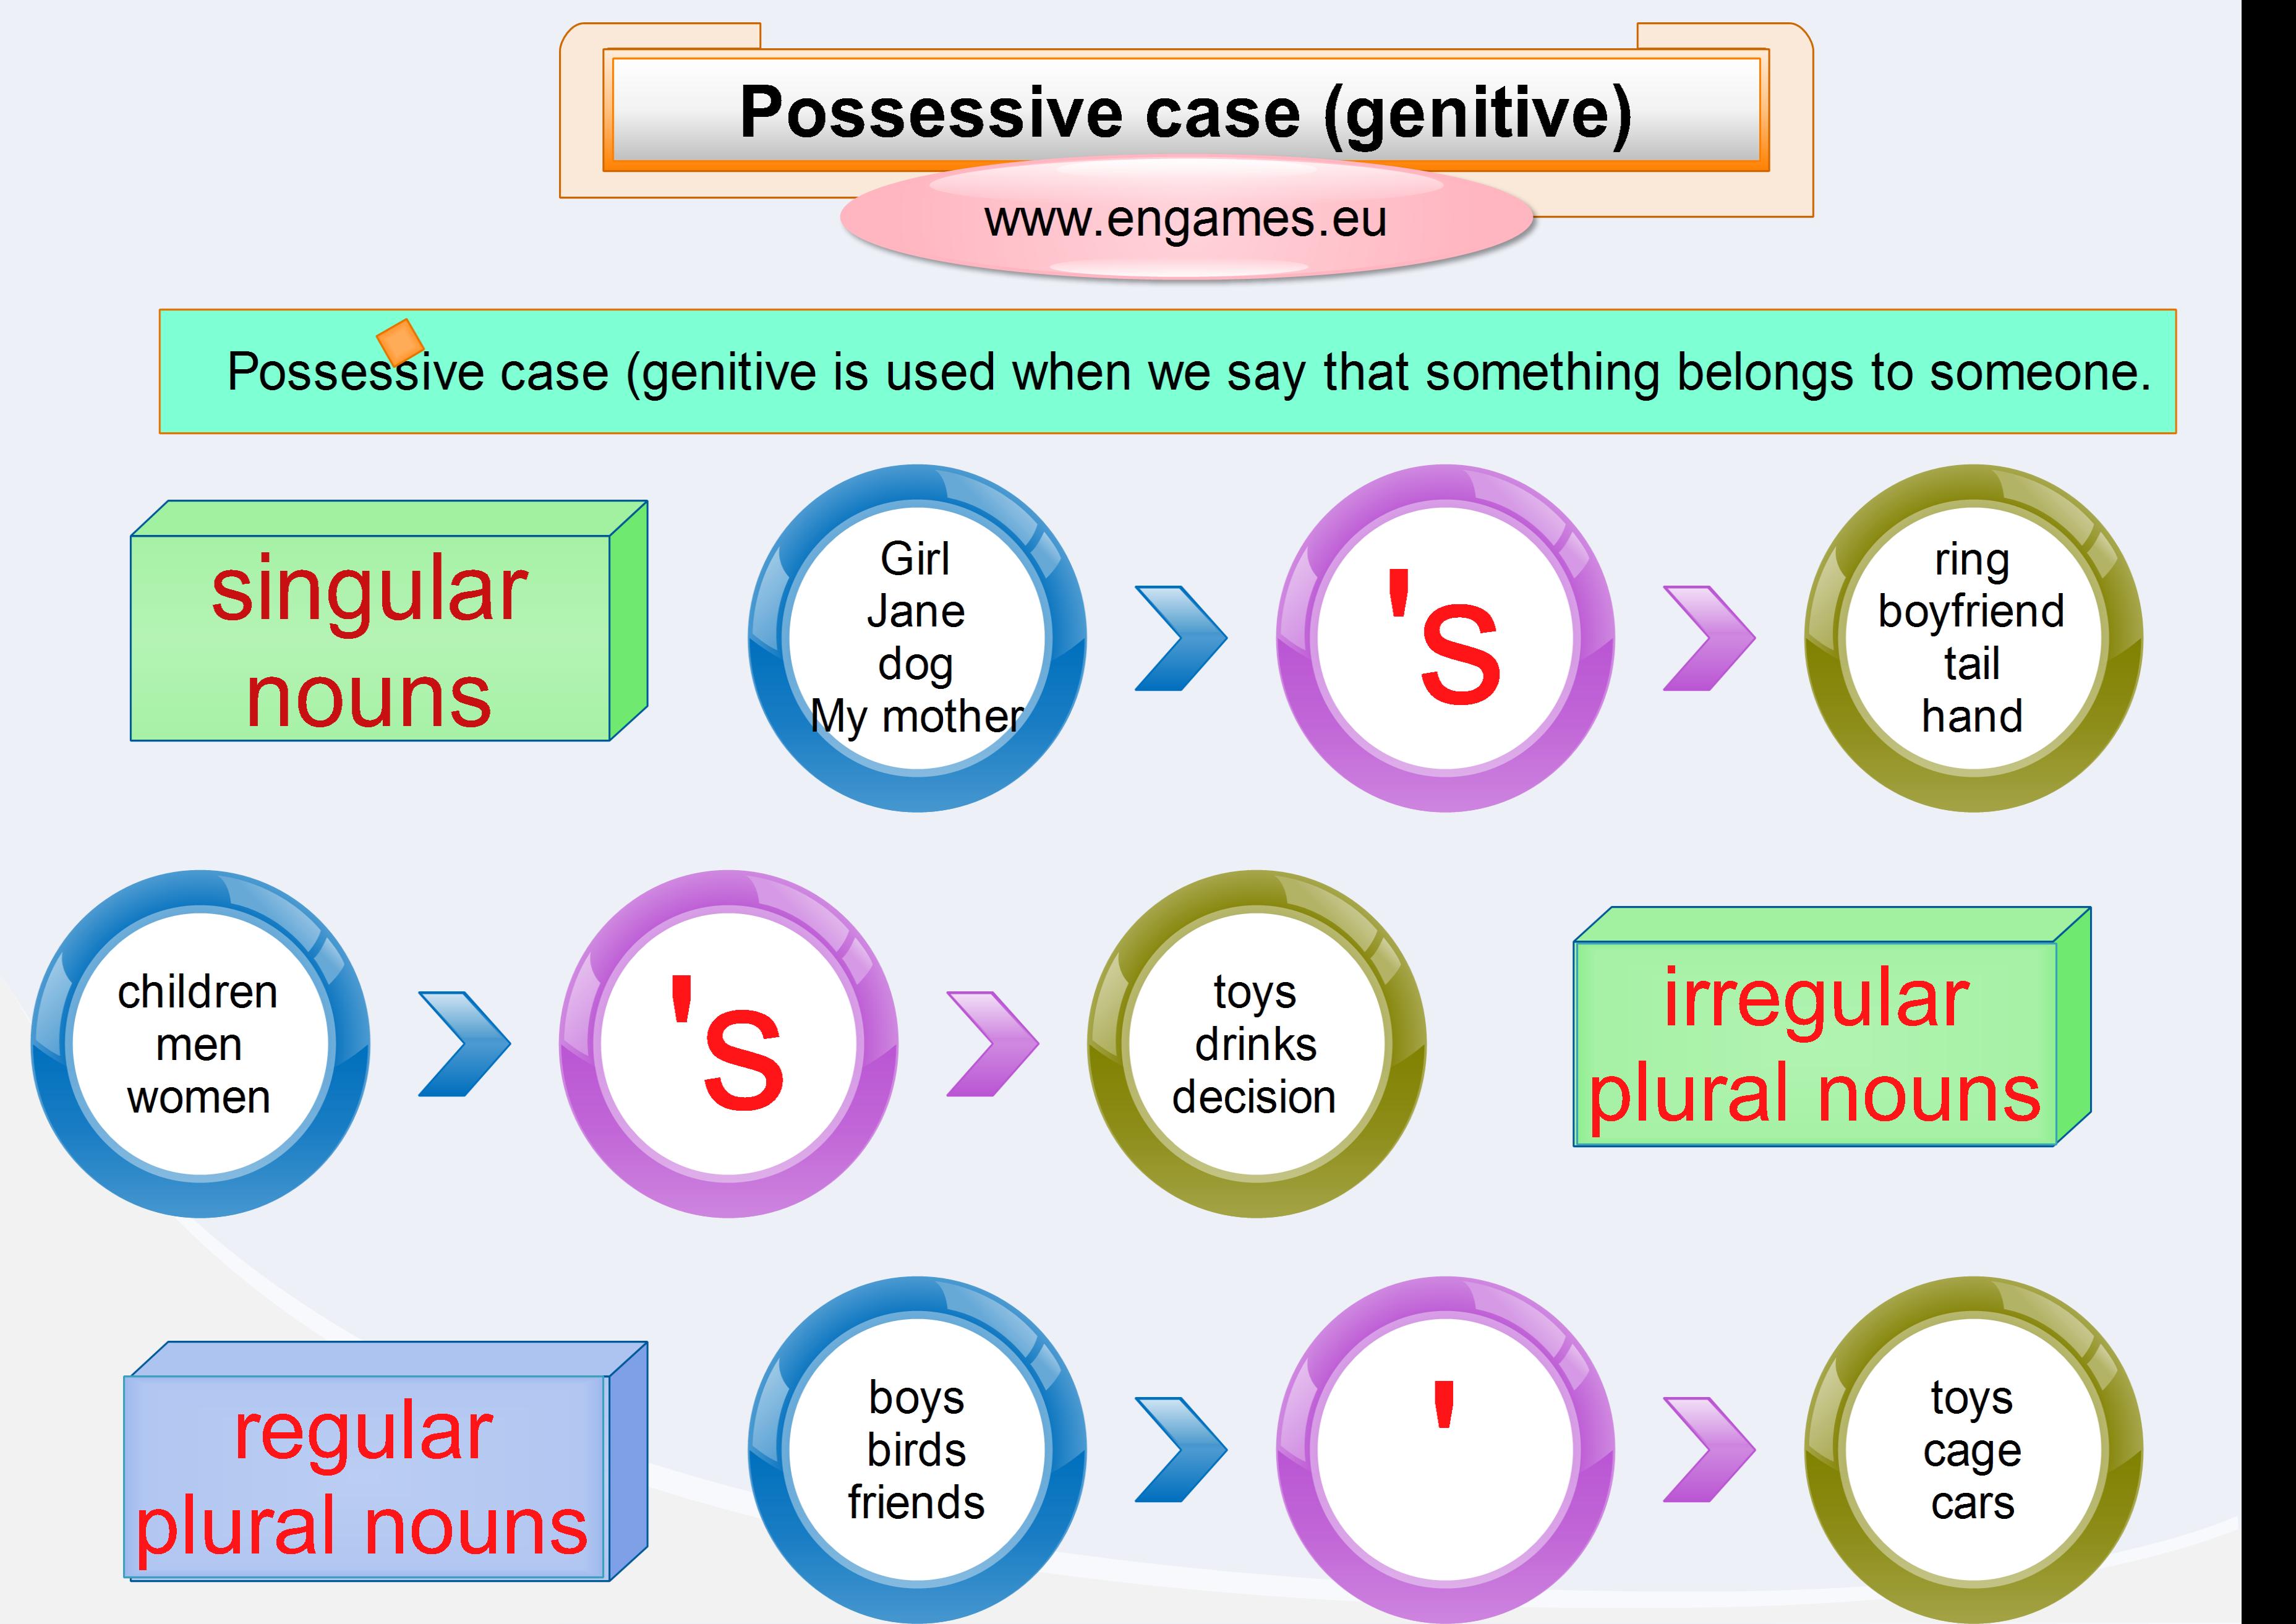 https://www.engames.eu/wp-content/uploads/2014/07/possessive_case_IIm.png